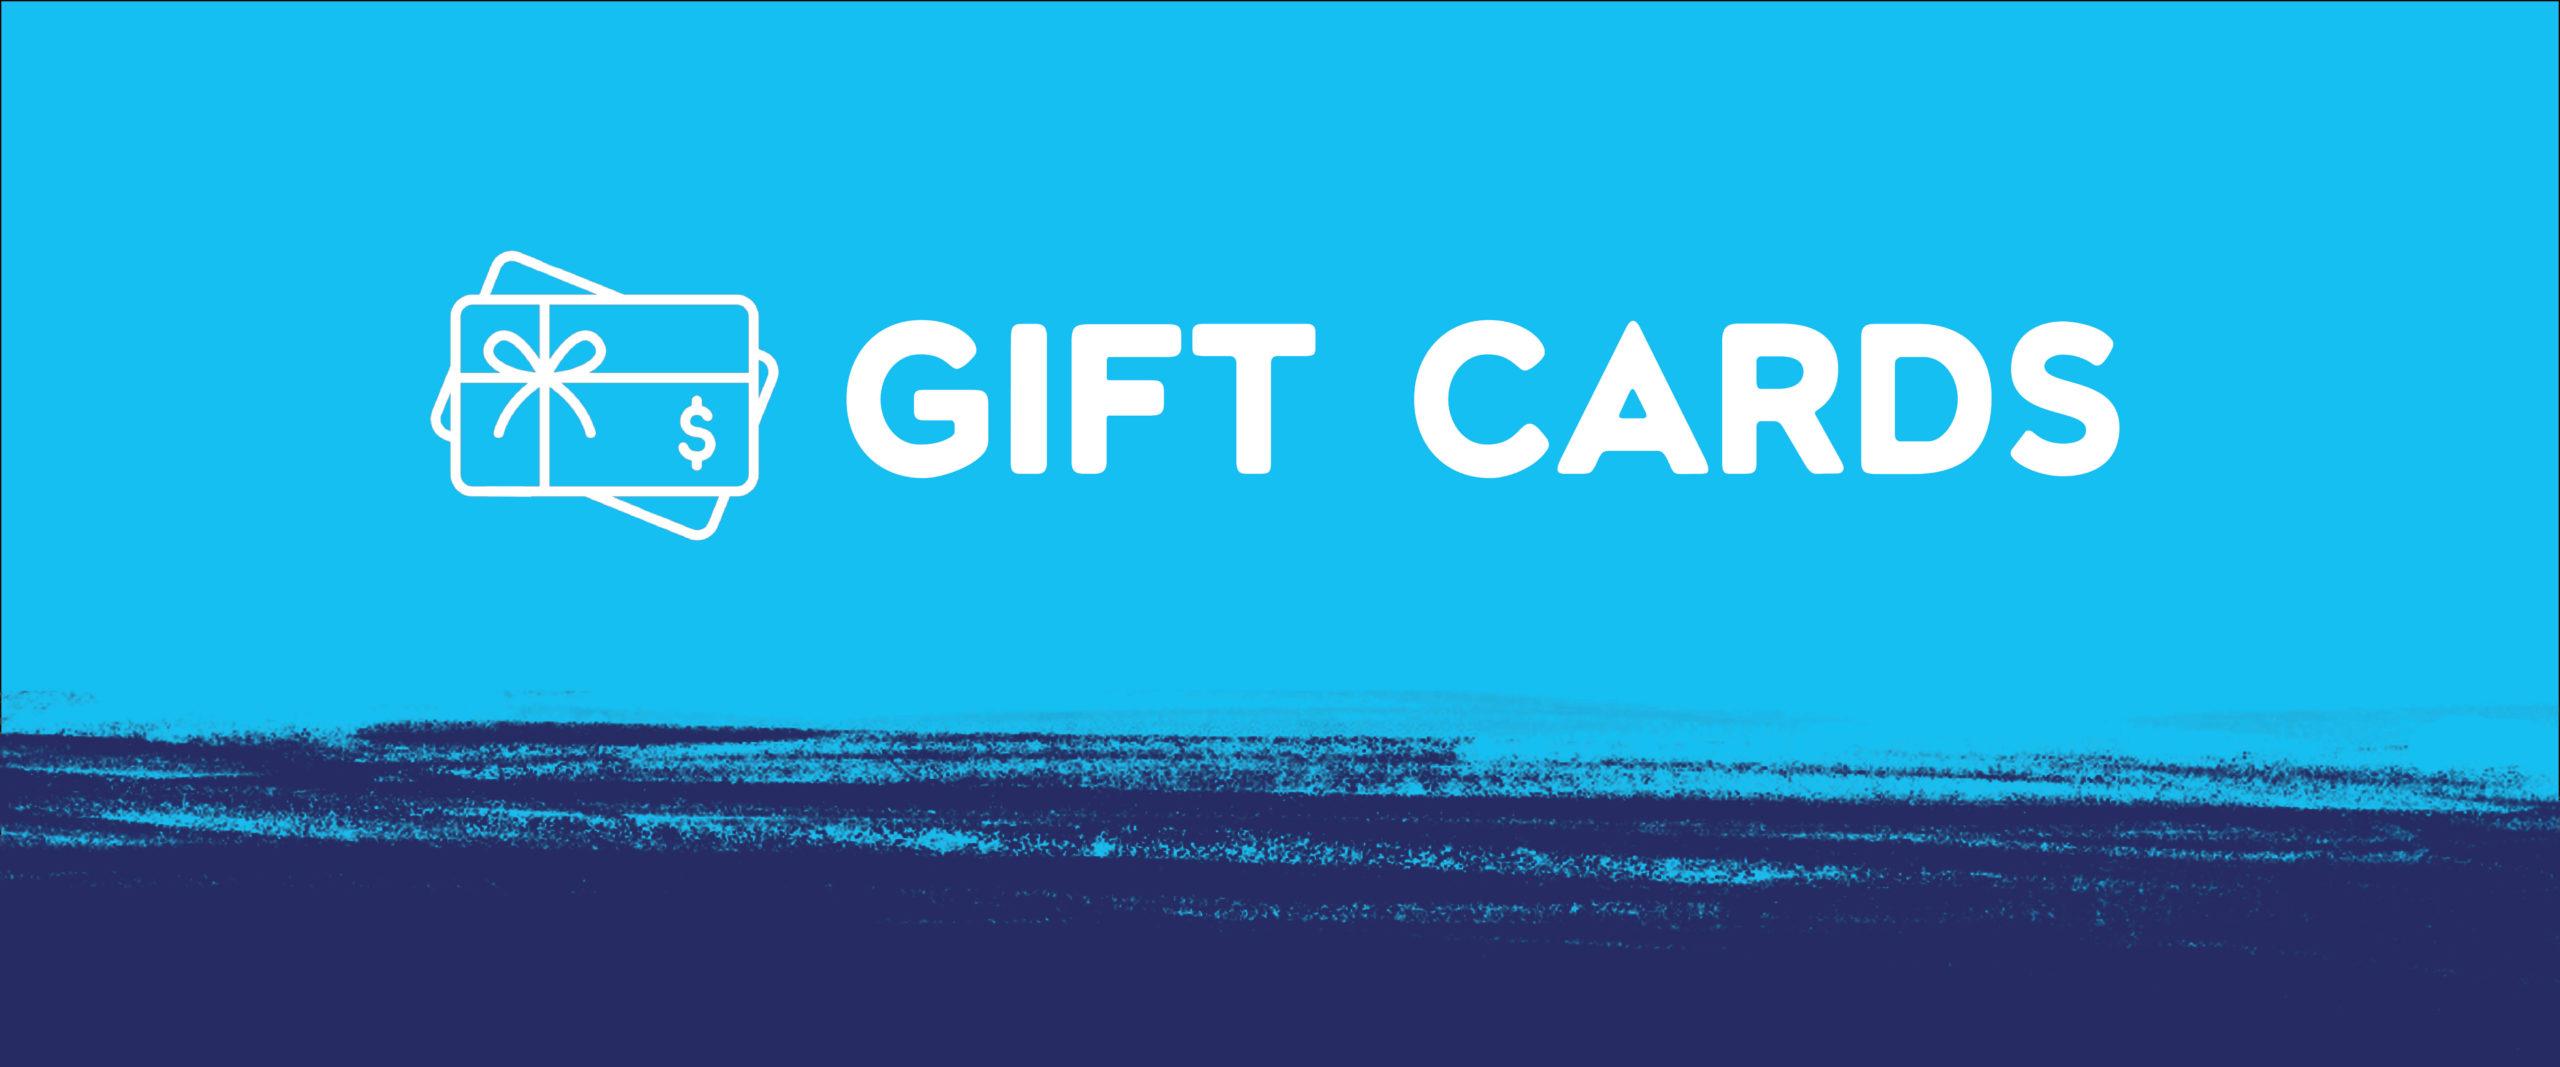 Gift voucher desktop banner